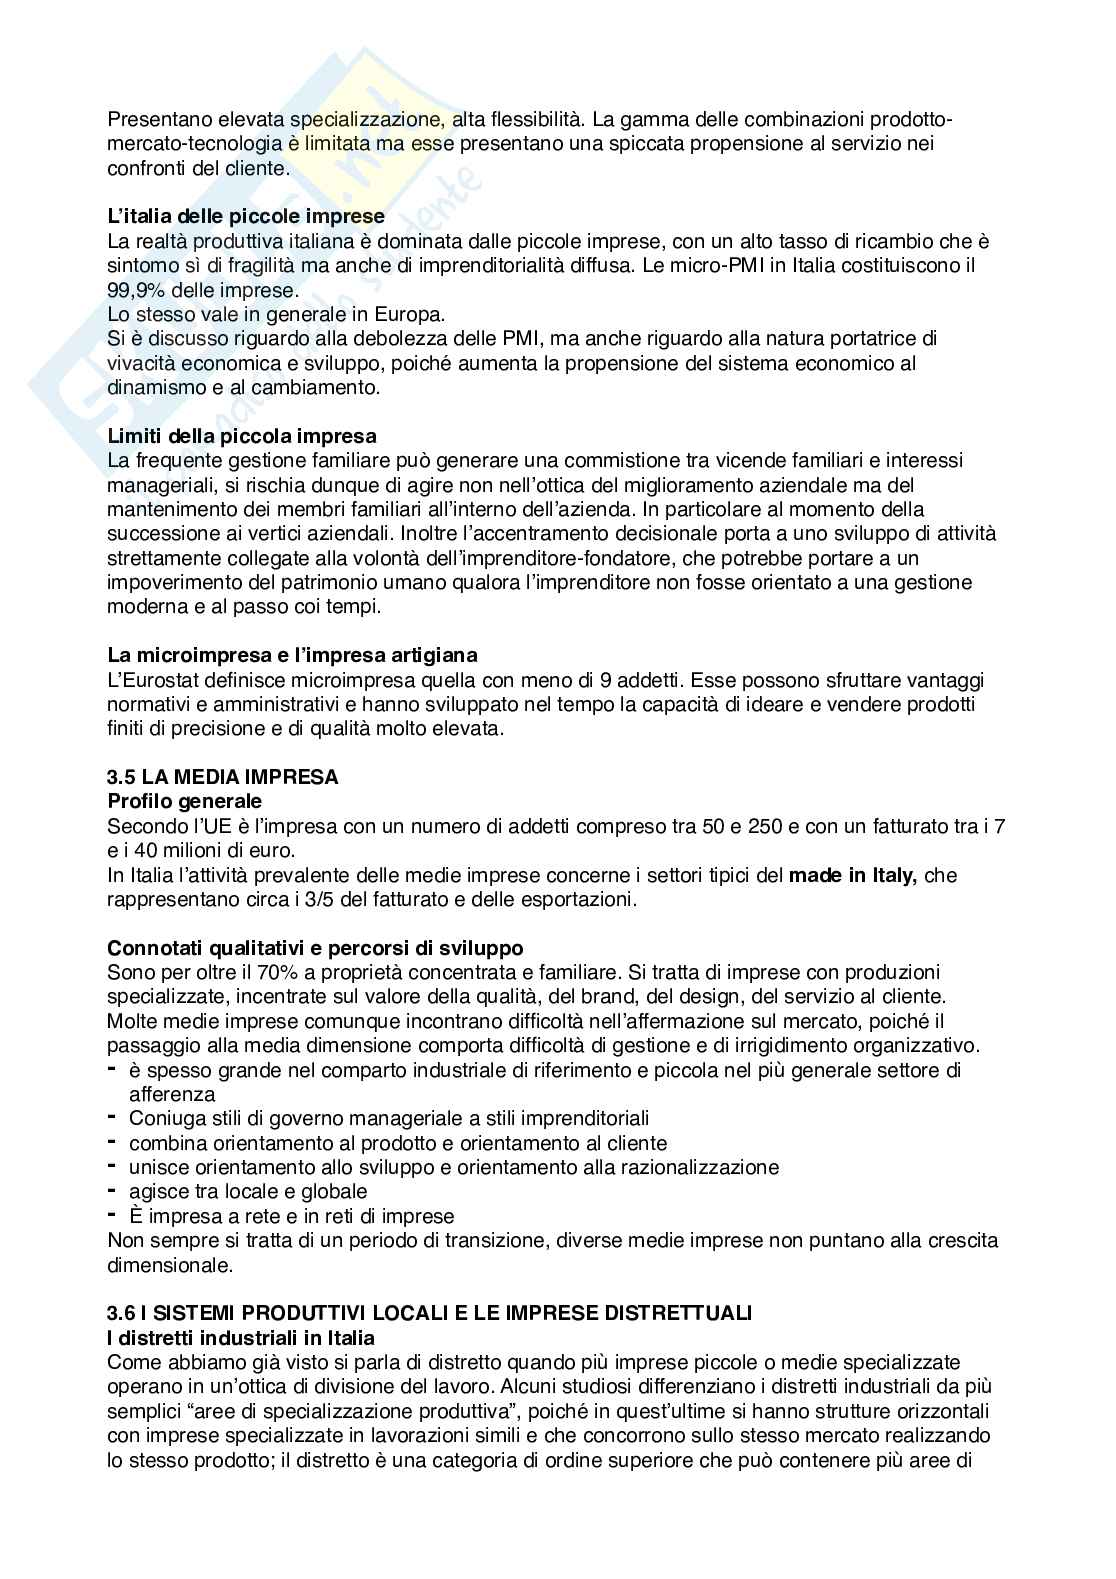 Management - Riassunto lezioni Pag. 11